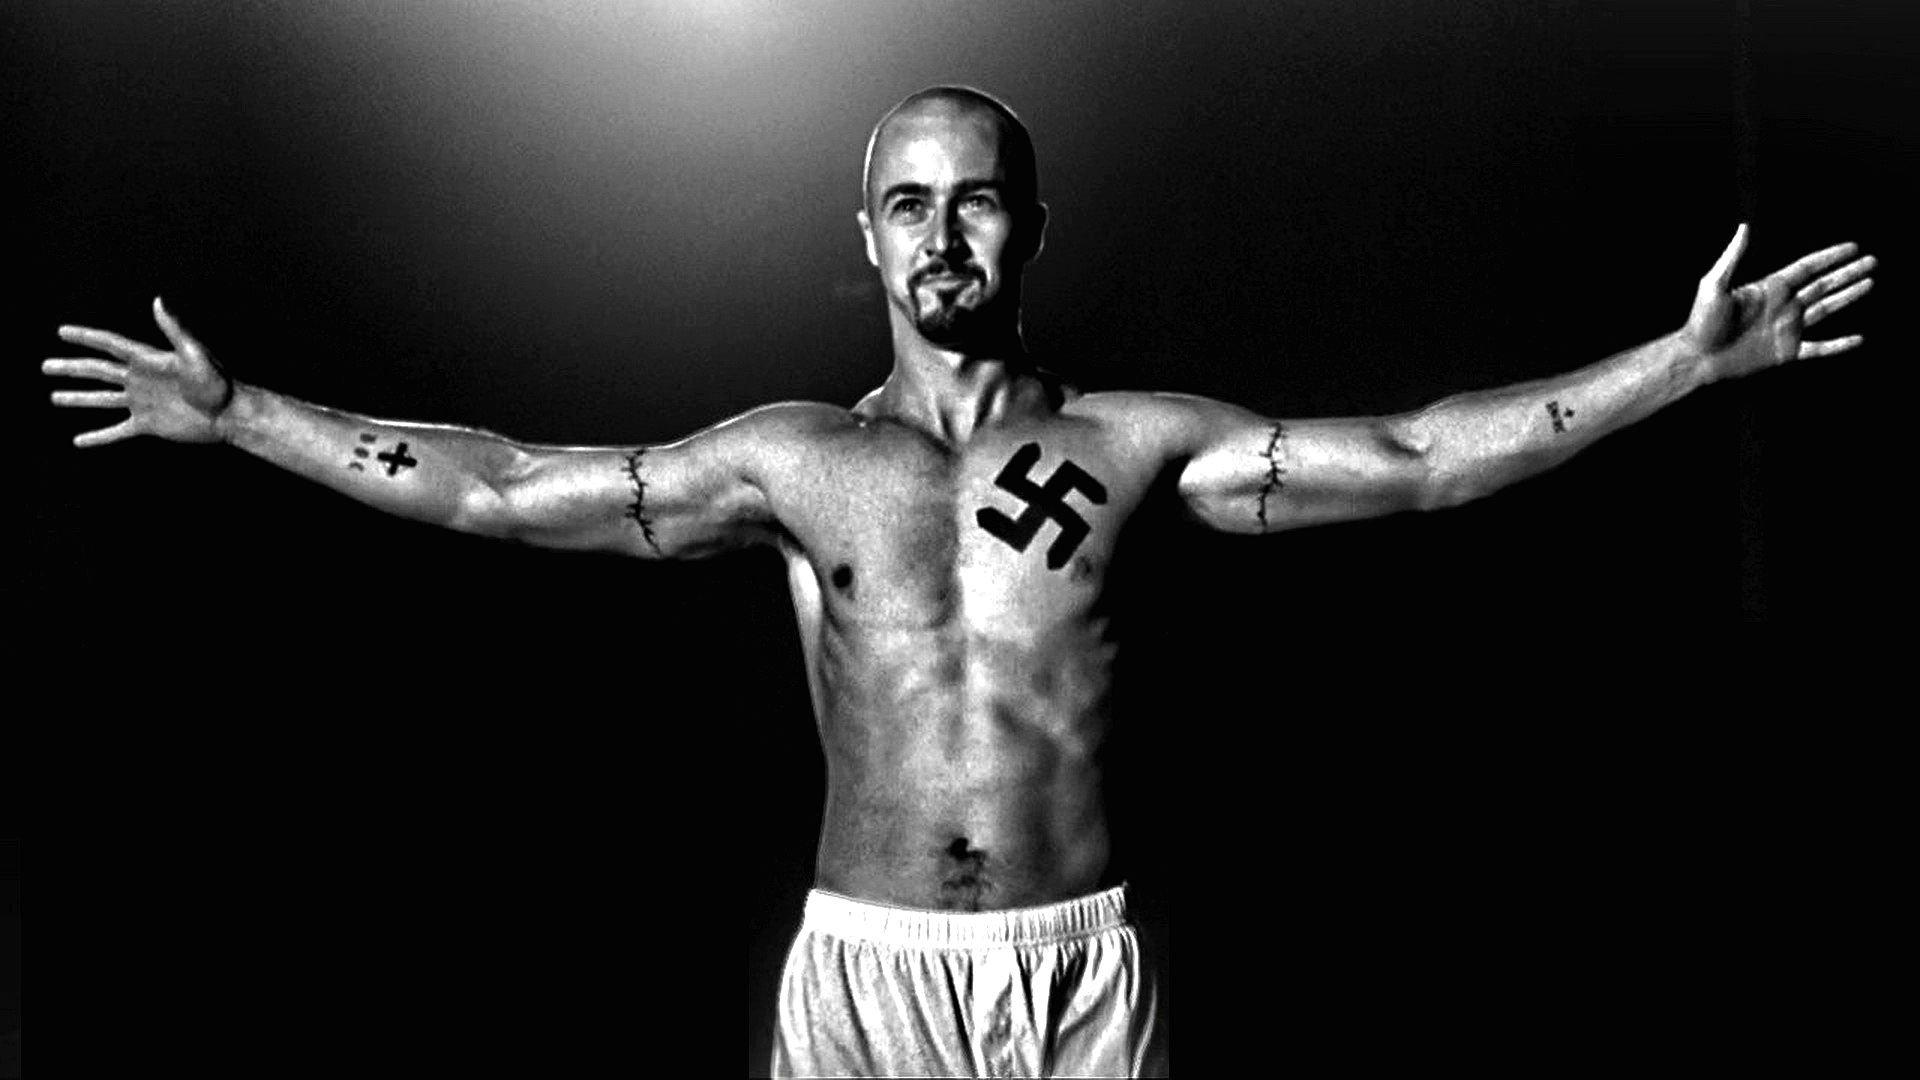 HISTORY X crime drama neo nazi nazi american history anarchy wallpaper 1920x1080